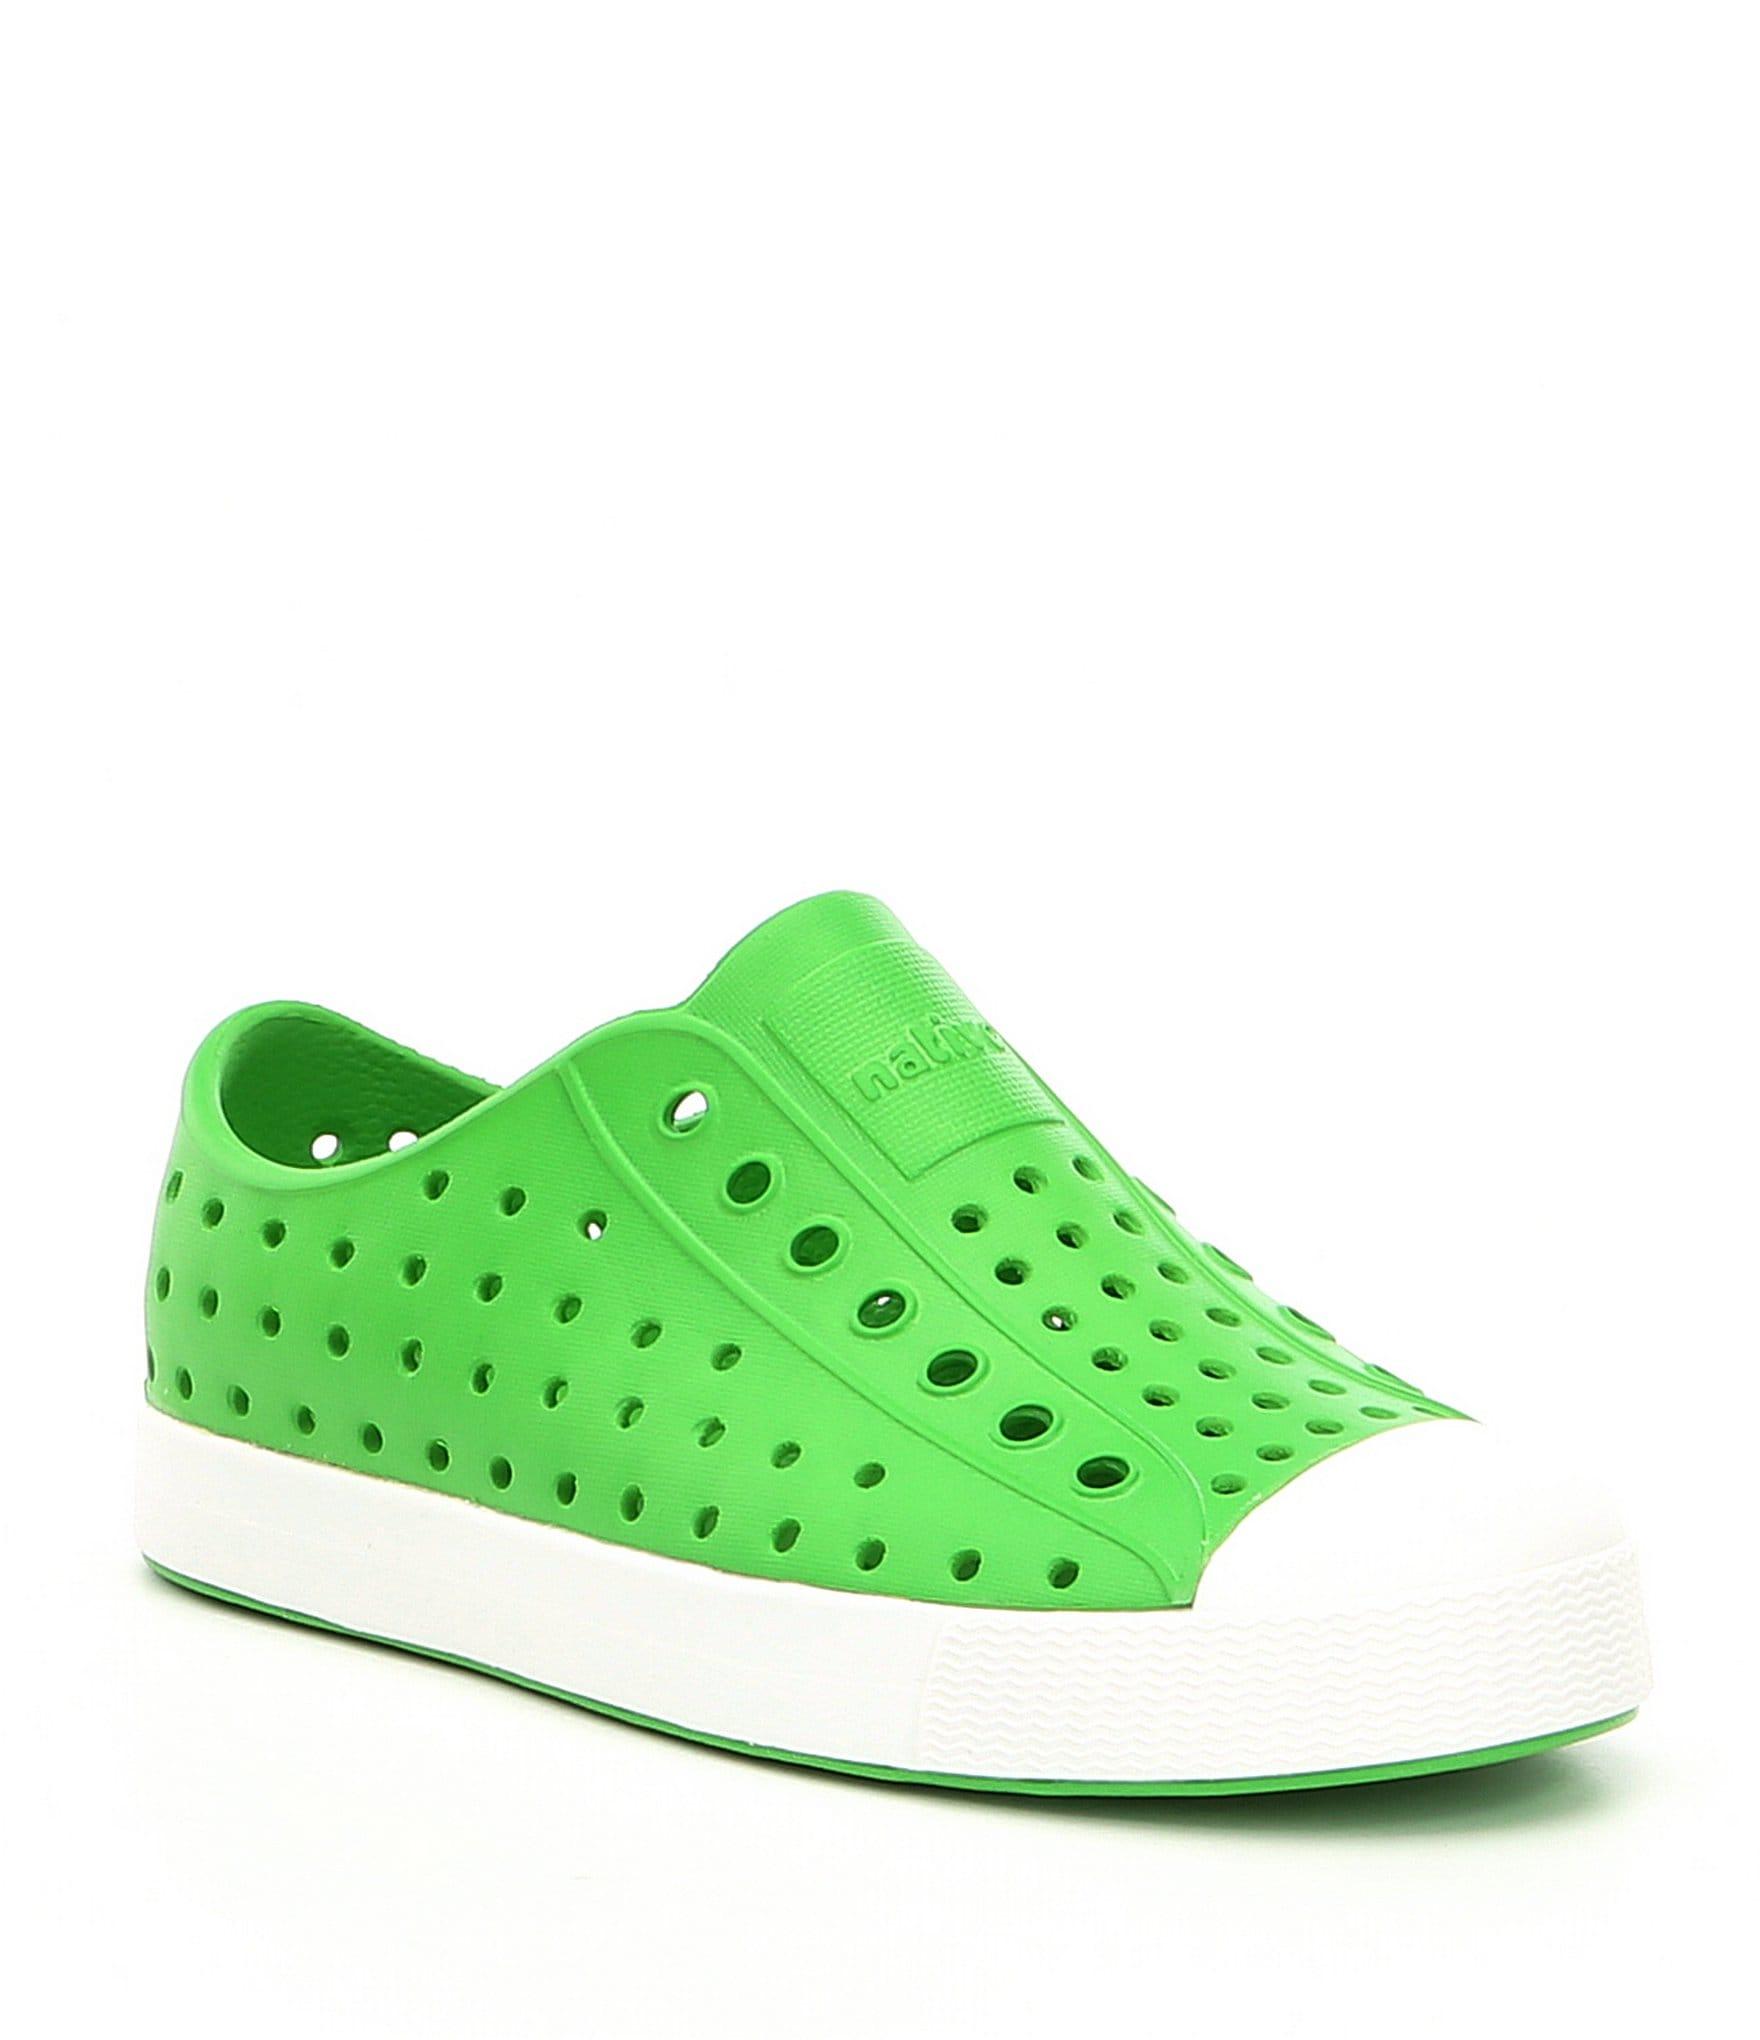 Toddler Boys\' Shoes | Dillards